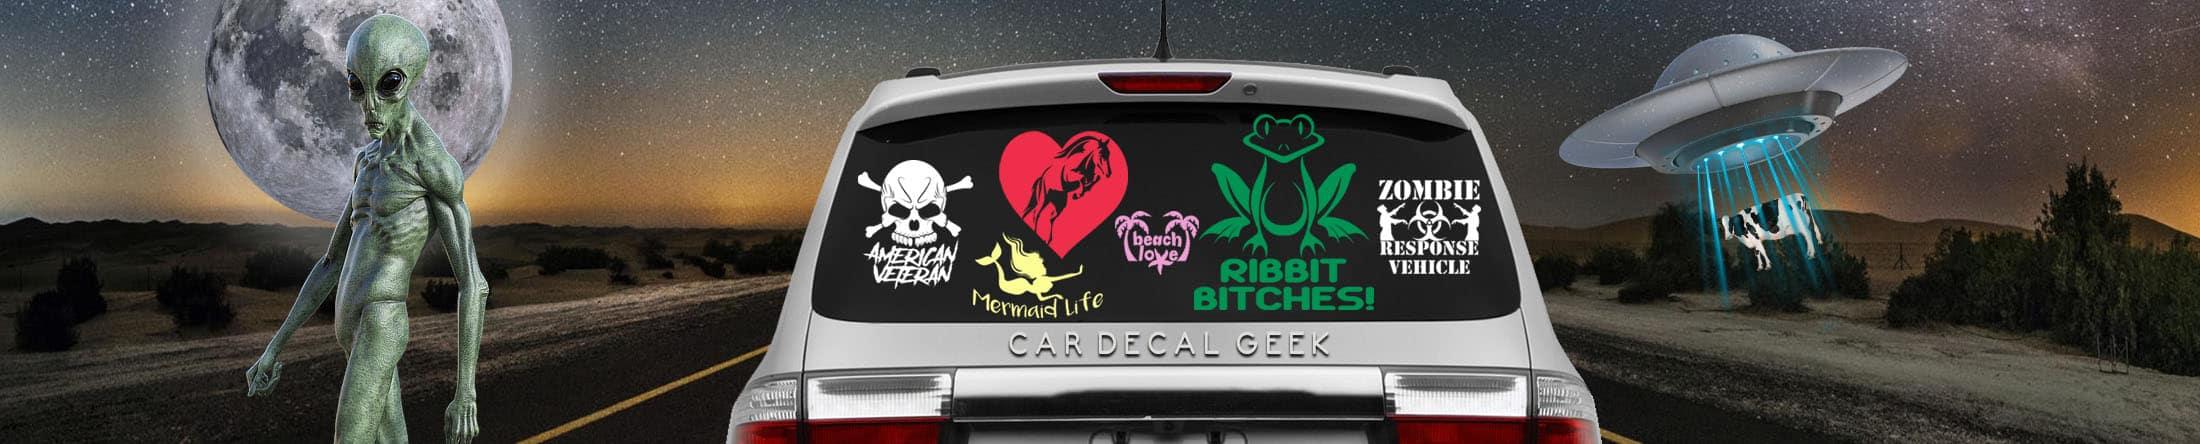 Car Decals Amp Window Stickers Wall Custom Vinyl Decals